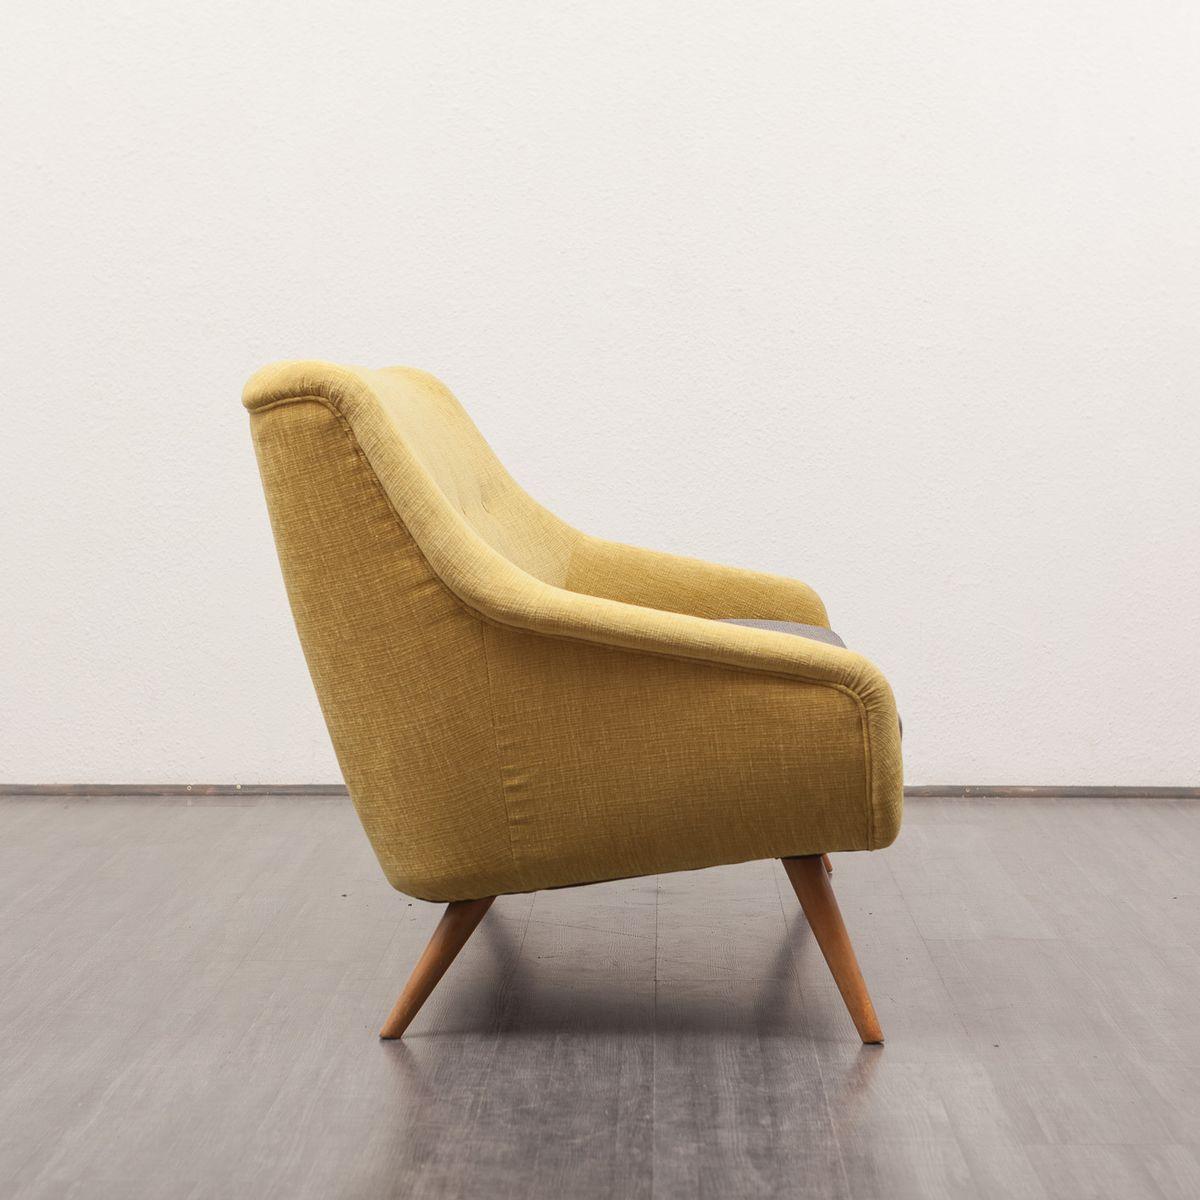 Vintage 3 Sitzer Sofa Bei Pamono Kaufen